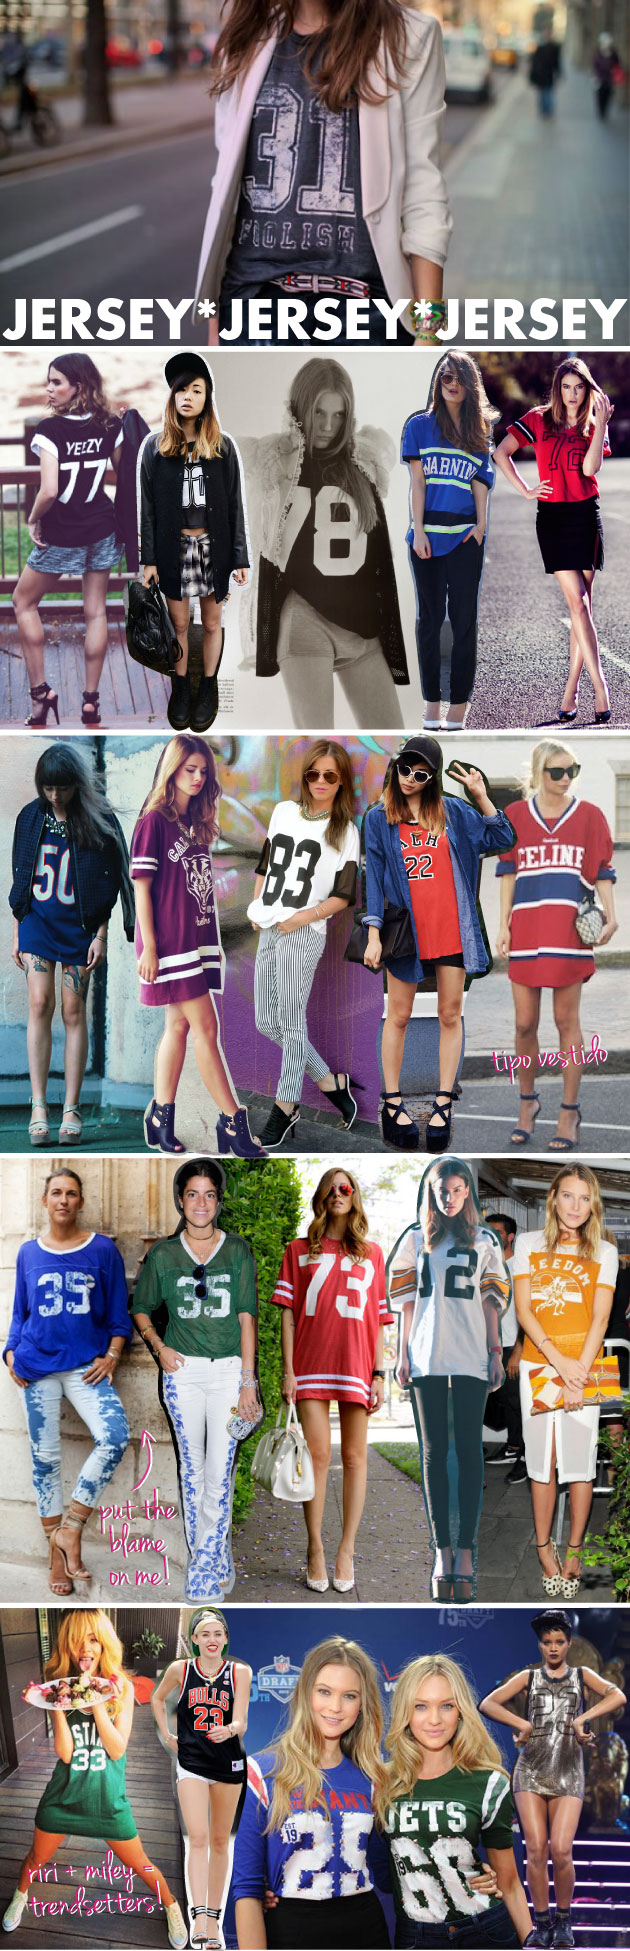 tendencia-camisa-de-futebol-americano-basquete-jersey-sportswear-rihanna-riri-miley-cyrus-isabel-marant-leandra-medine-chiara-ferragni-trend-sport-jersey-style-estilo